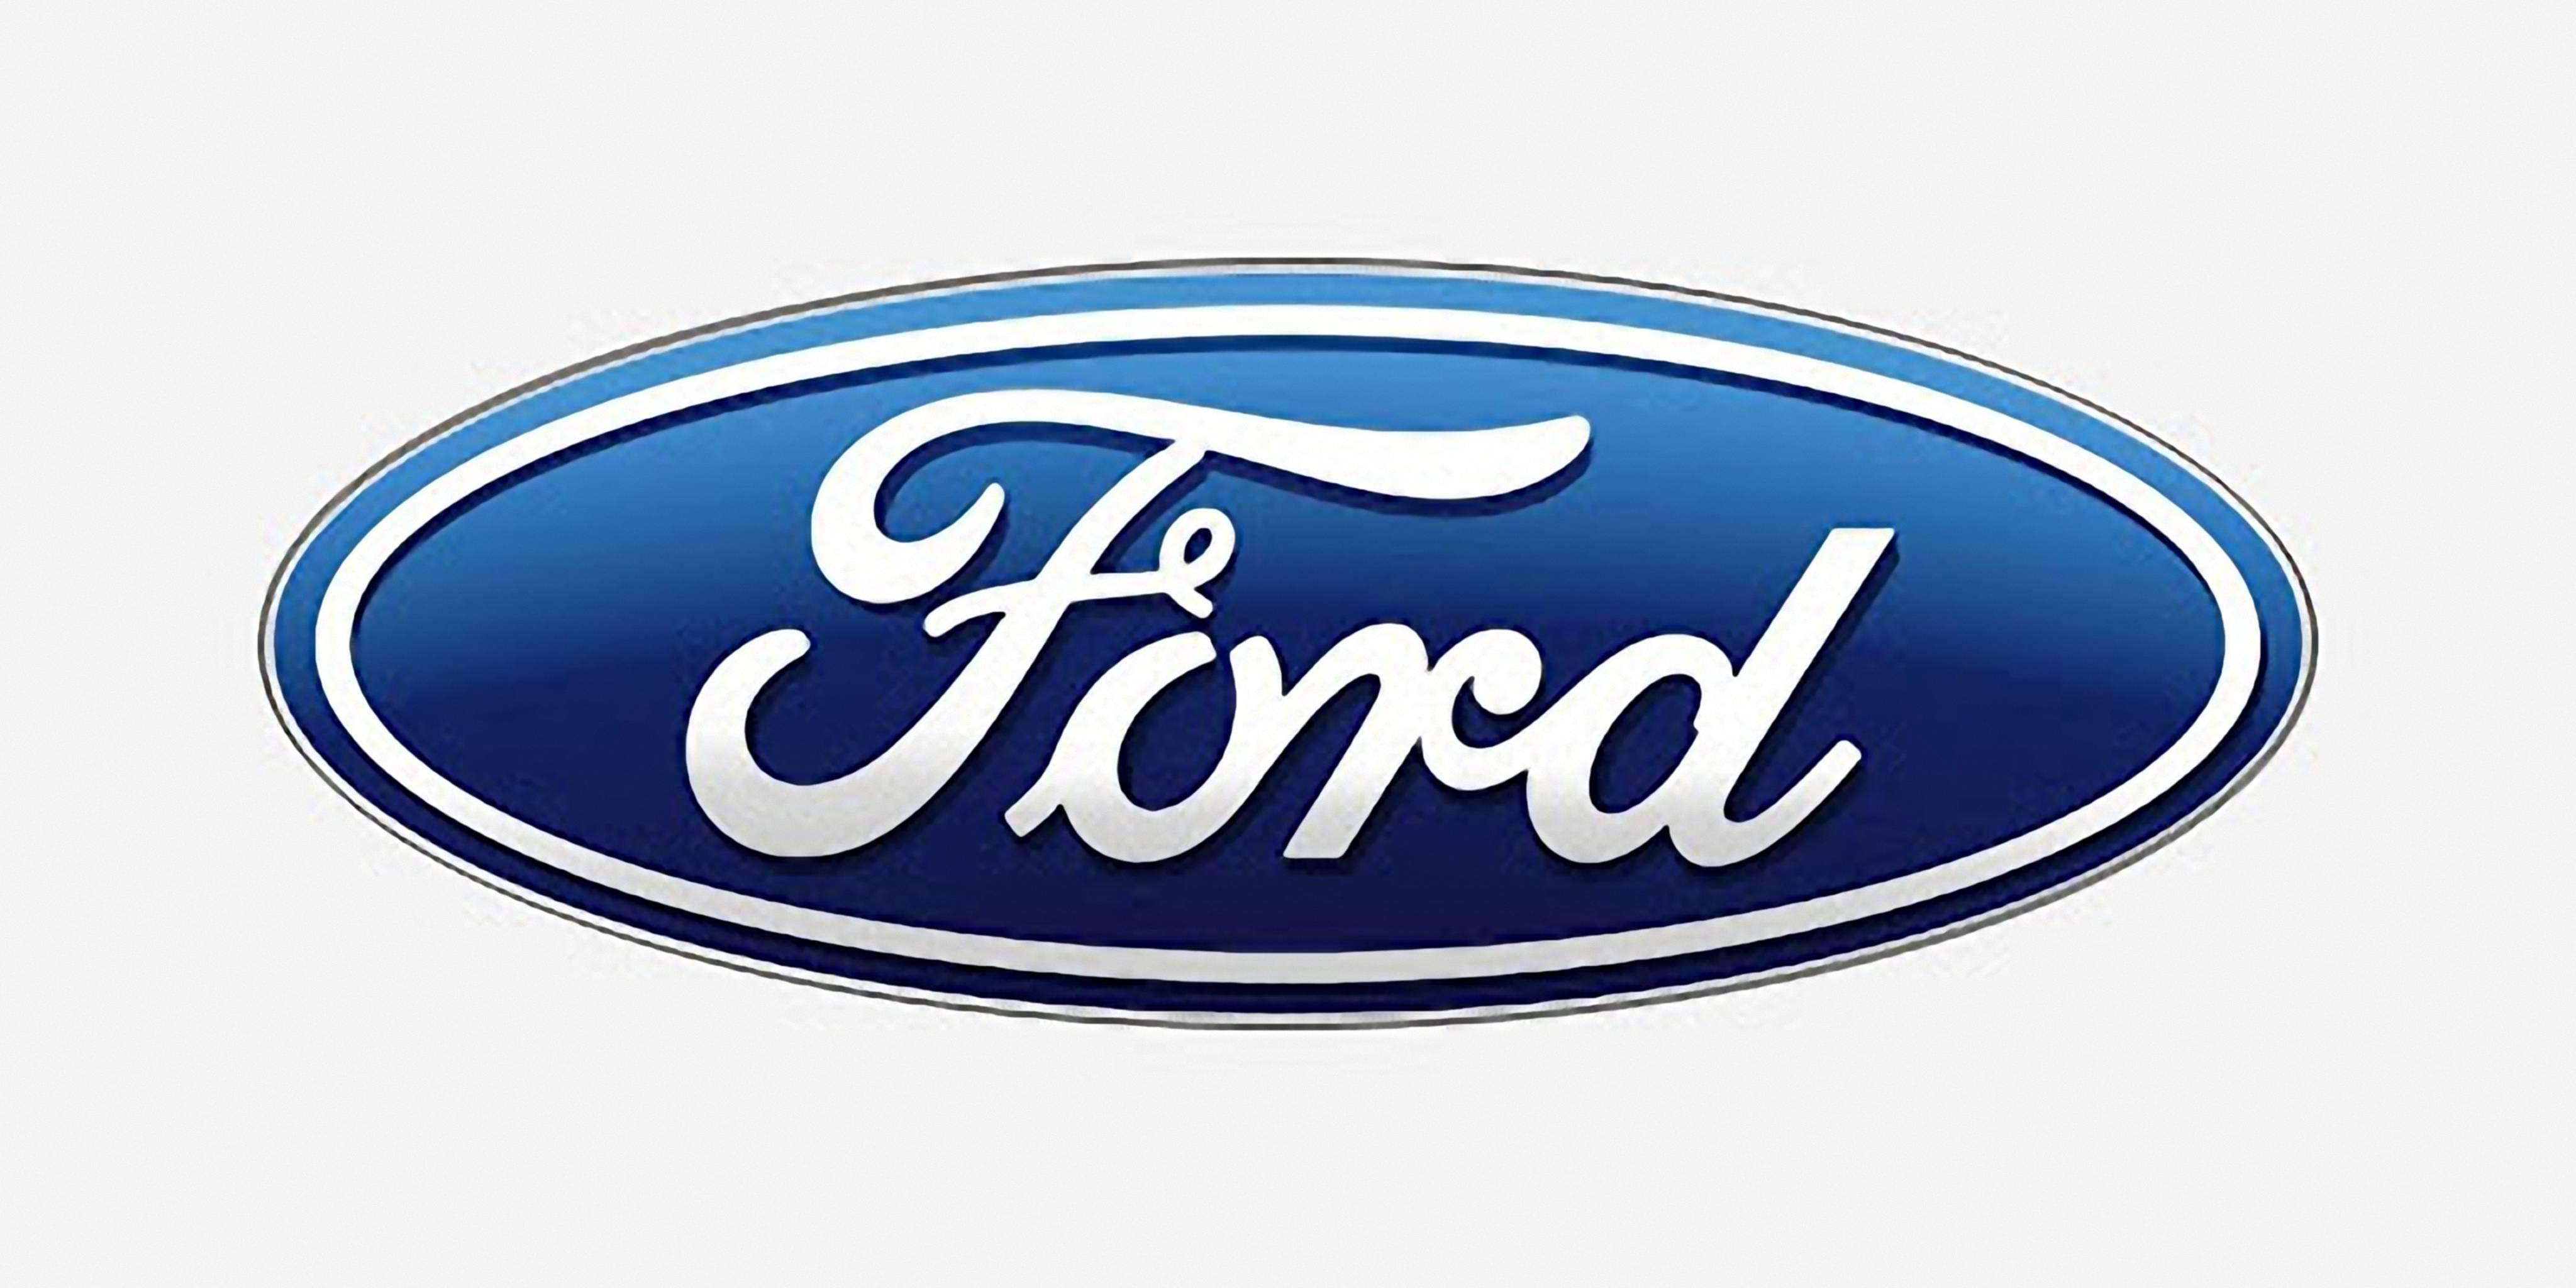 ford symbol wallpaper images